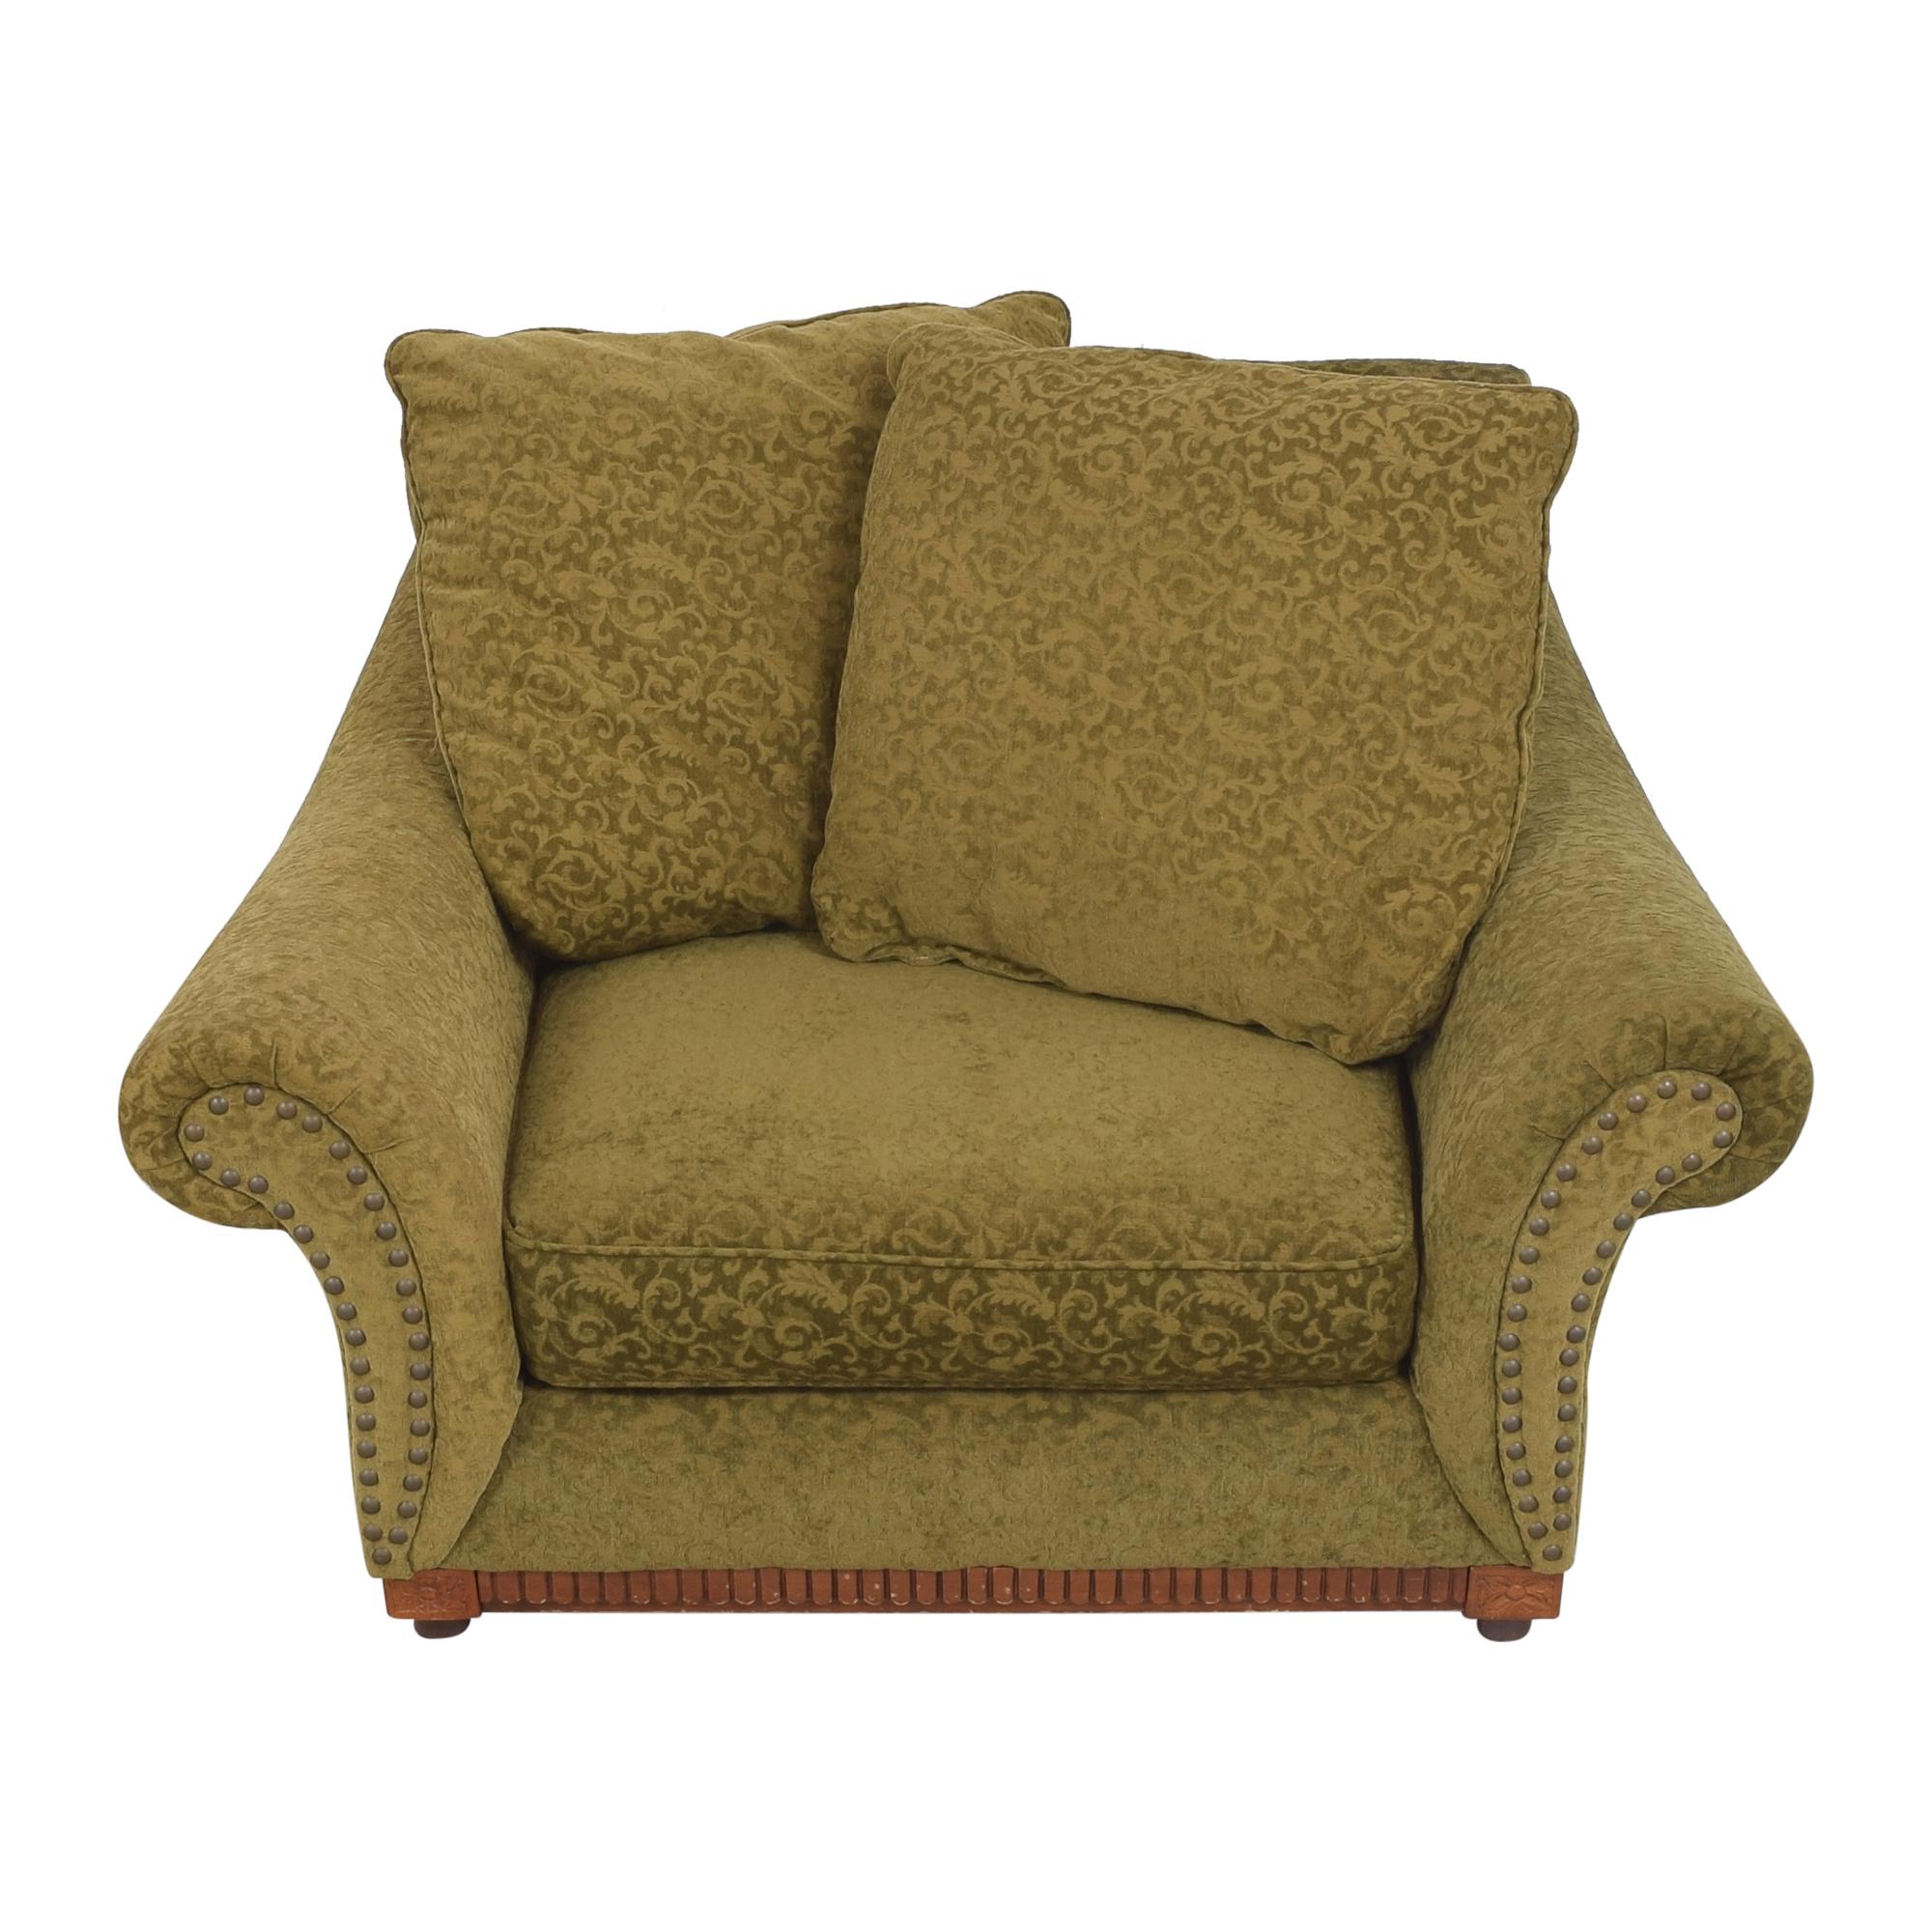 Bauhaus Furniture Bauhaus Accent Armchair Chairs